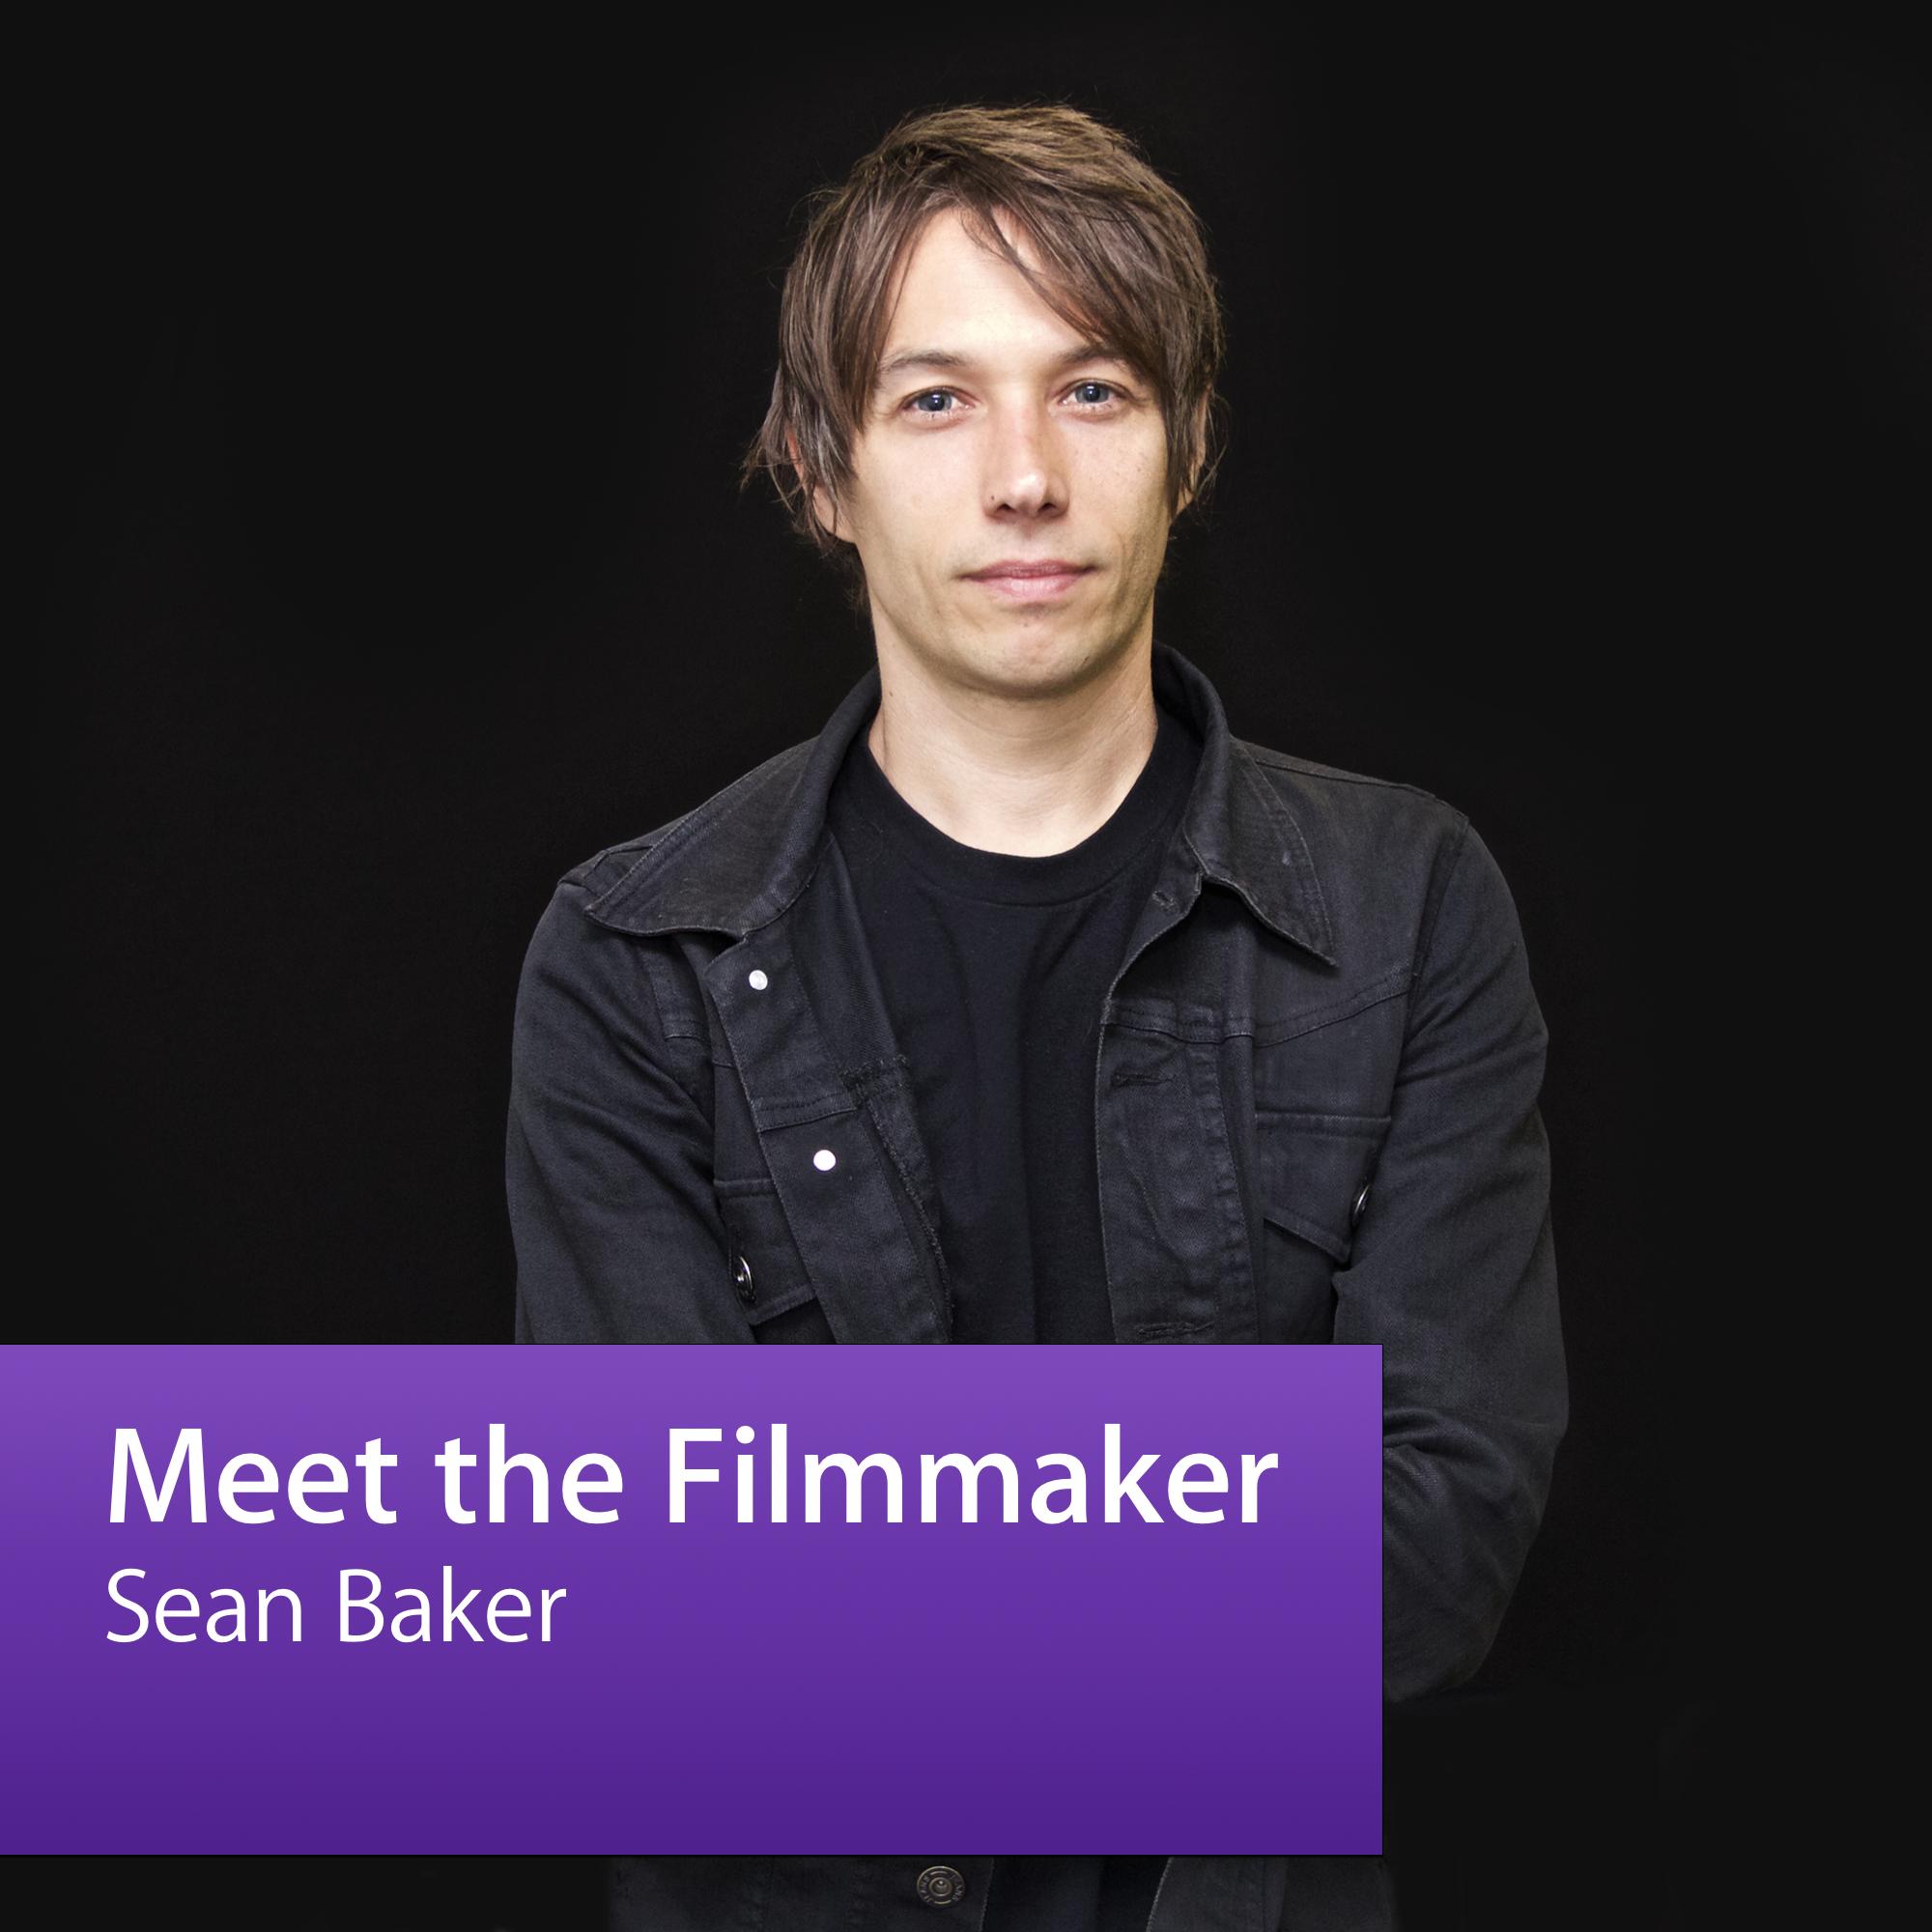 Tangerine: Meet the Filmmaker